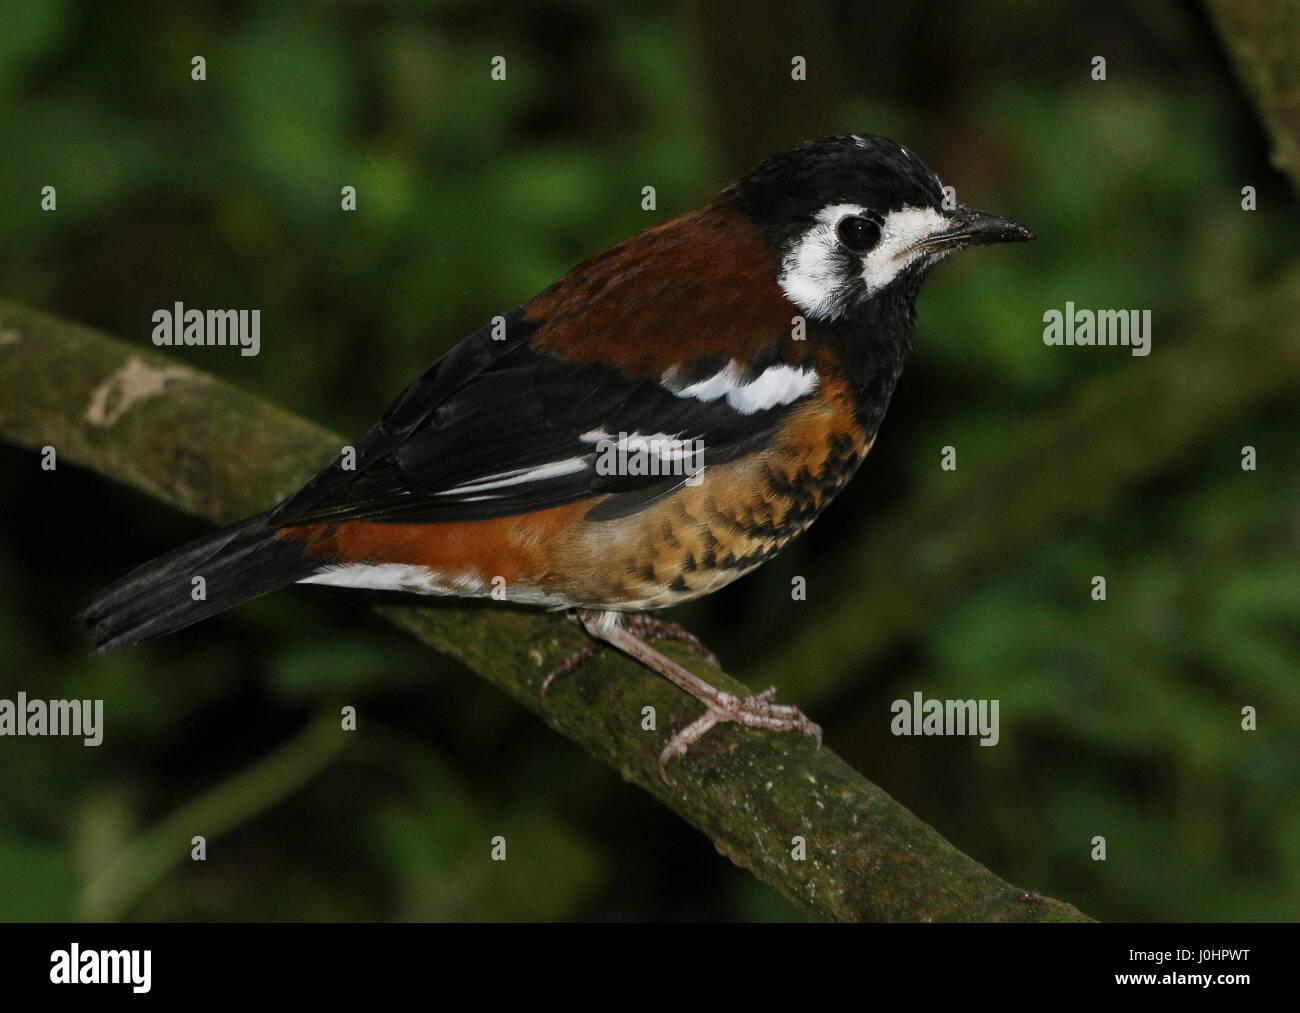 Asian Chestnut backed ground thrush (Geokichla dohertyi, Zoothera dohertyi), native to the Indonesian Sunda islands - Stock Image